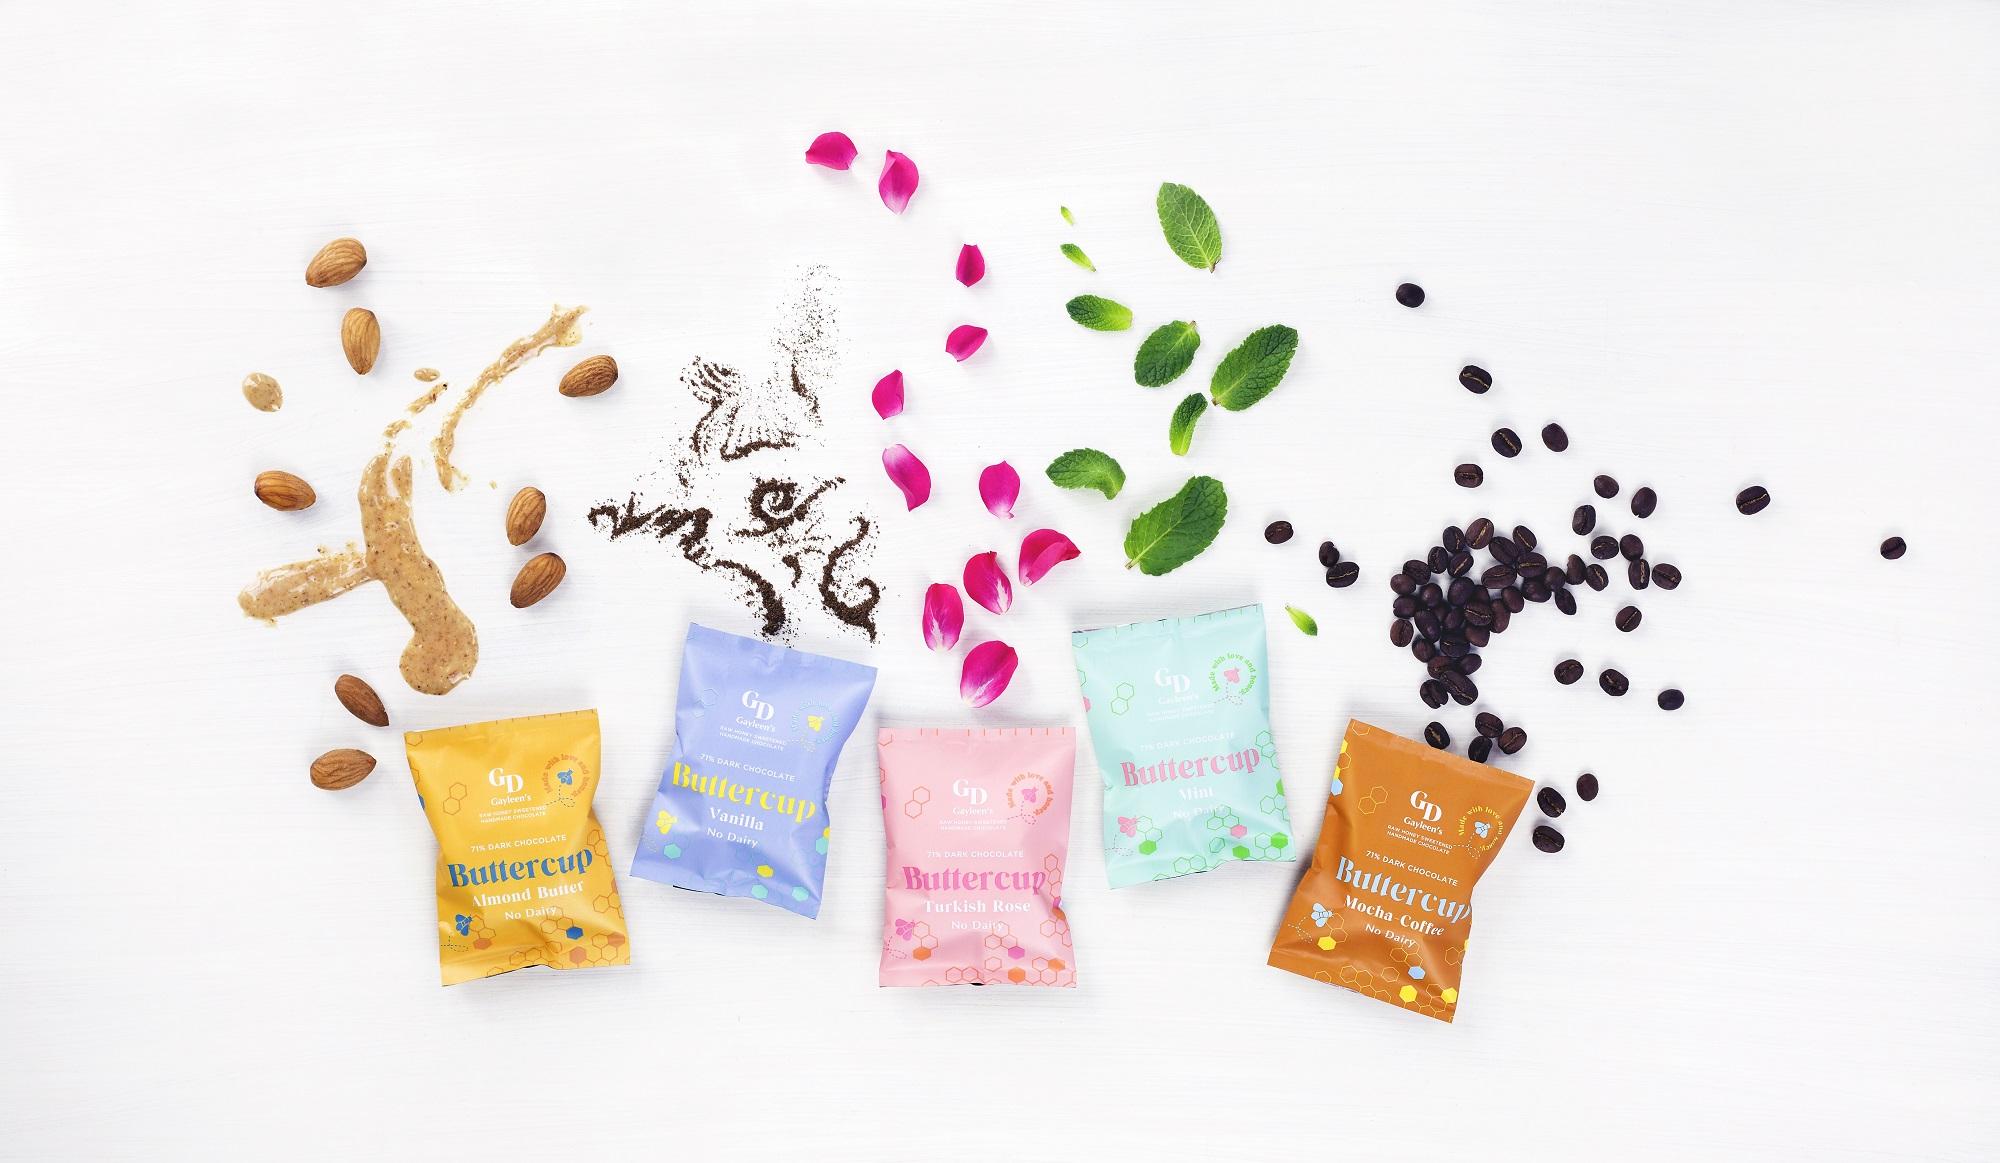 Celebrate World Chocolate Day 2021 with GD Chocolate!